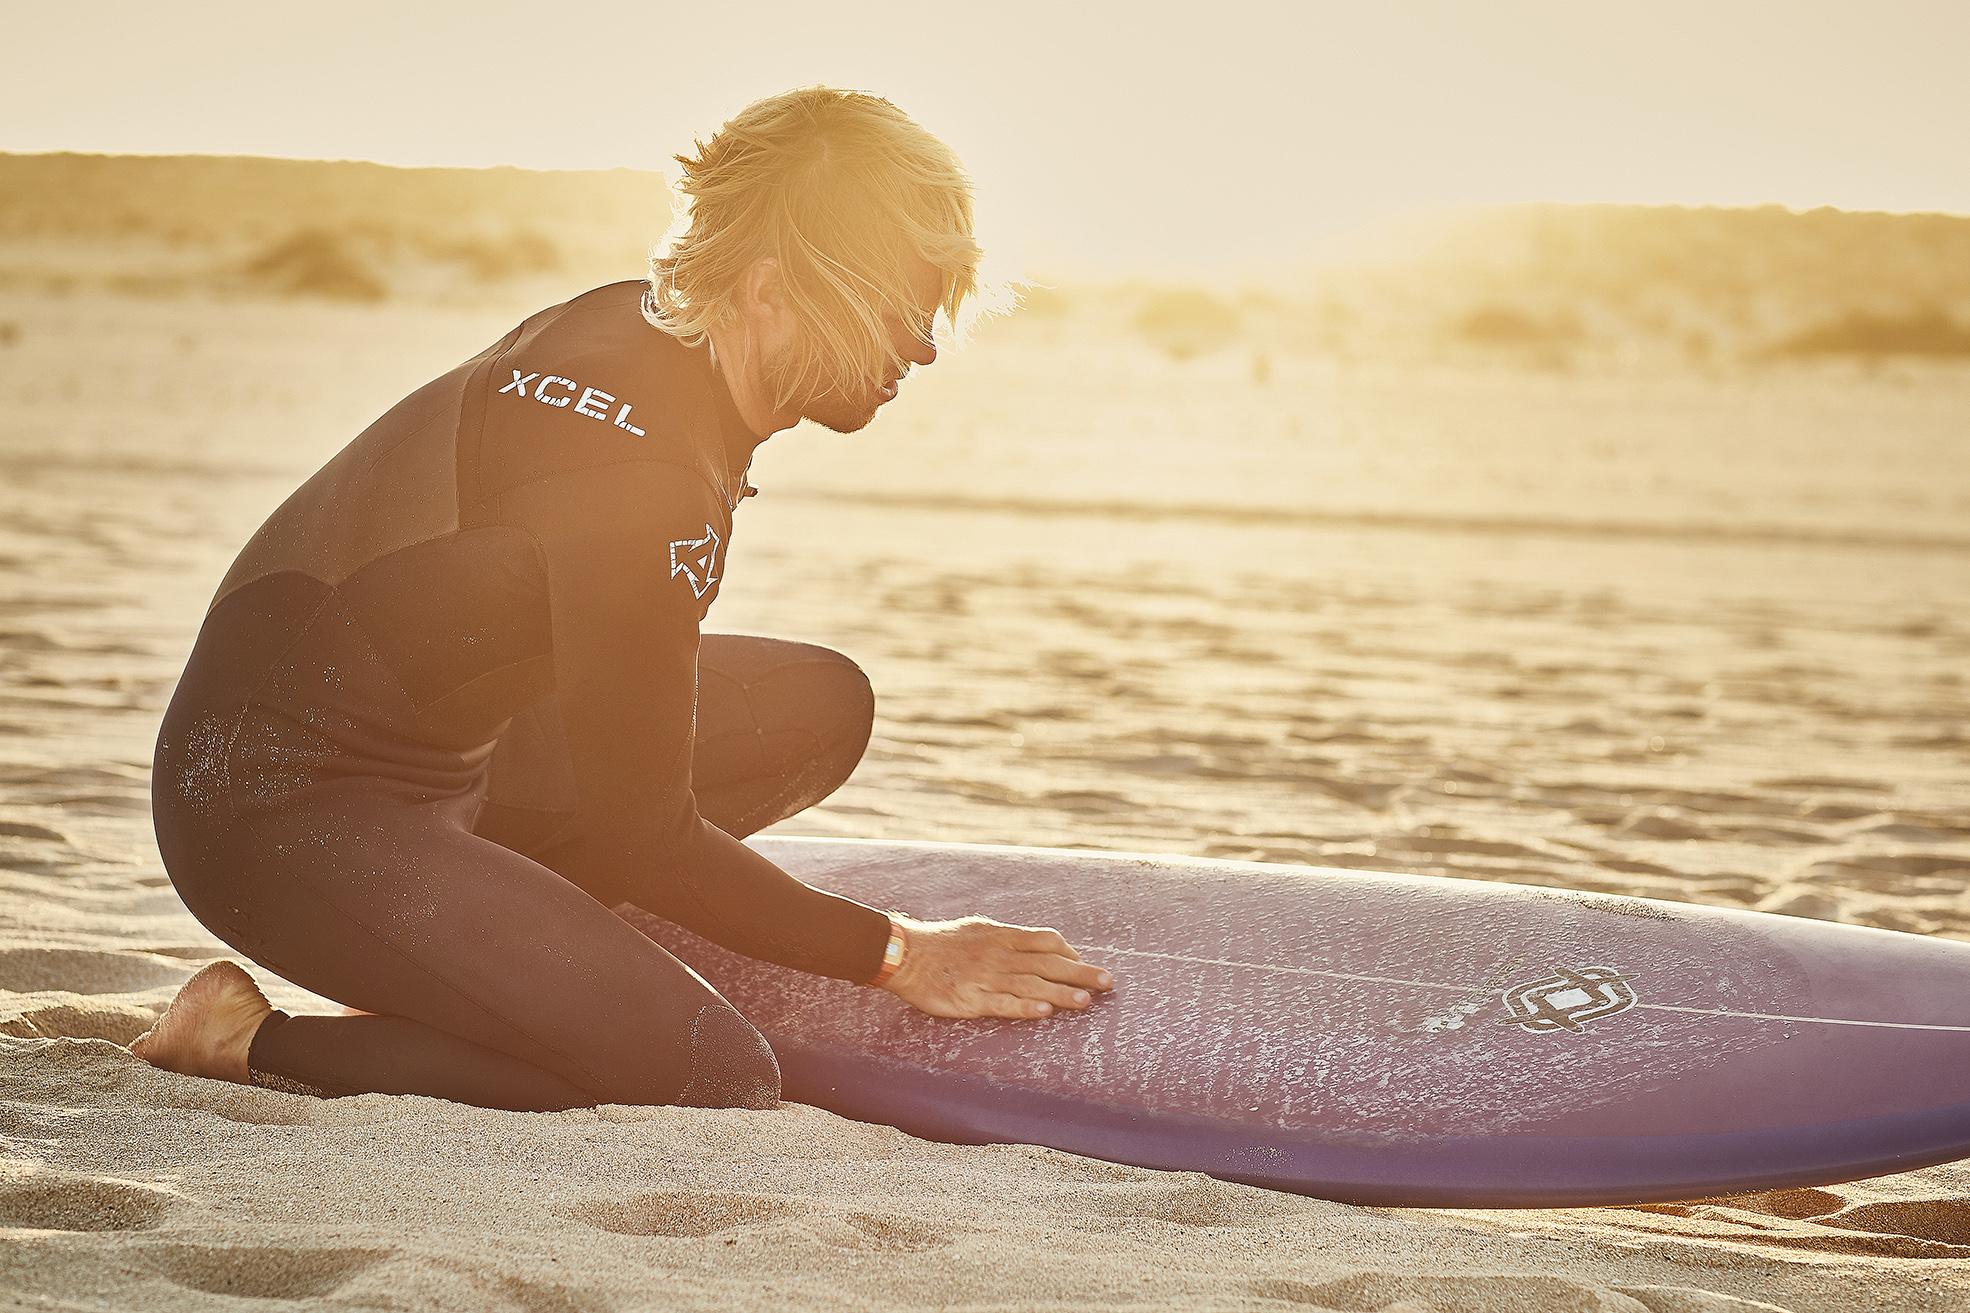 male surfer waxing his board